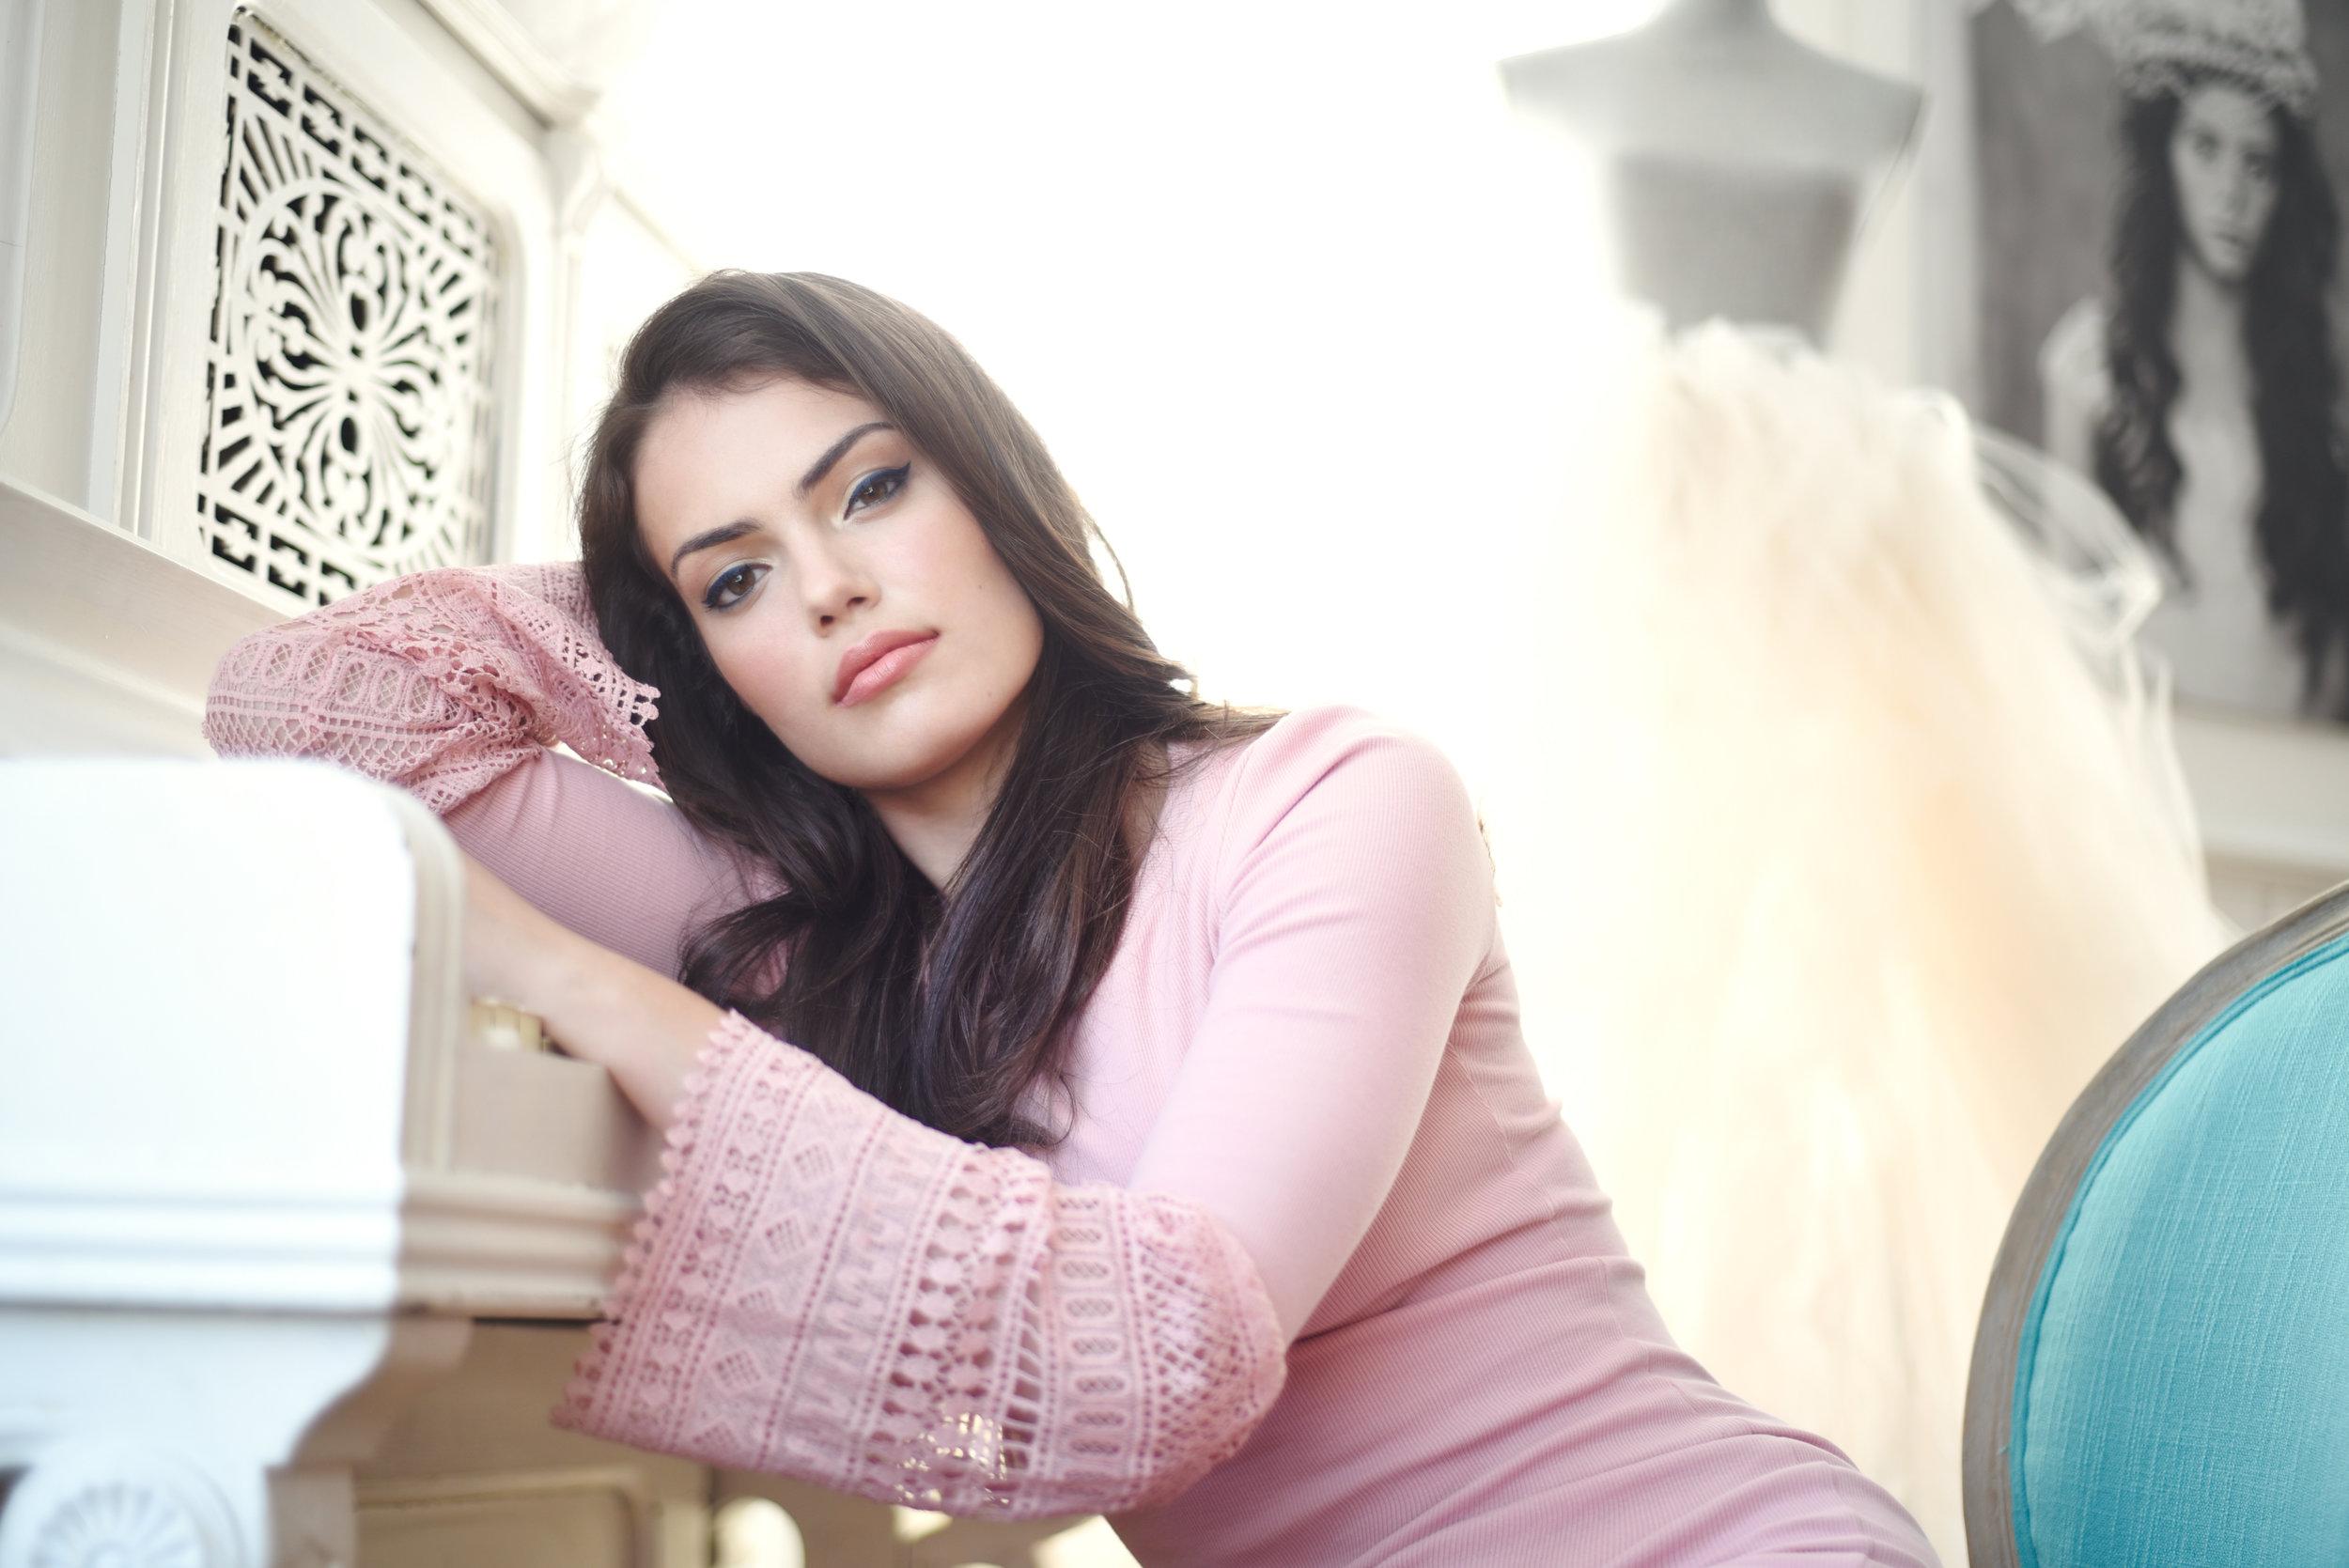 Marta-Hewson-Ivana-Glavic-Model-Portfolio-54035.jpg